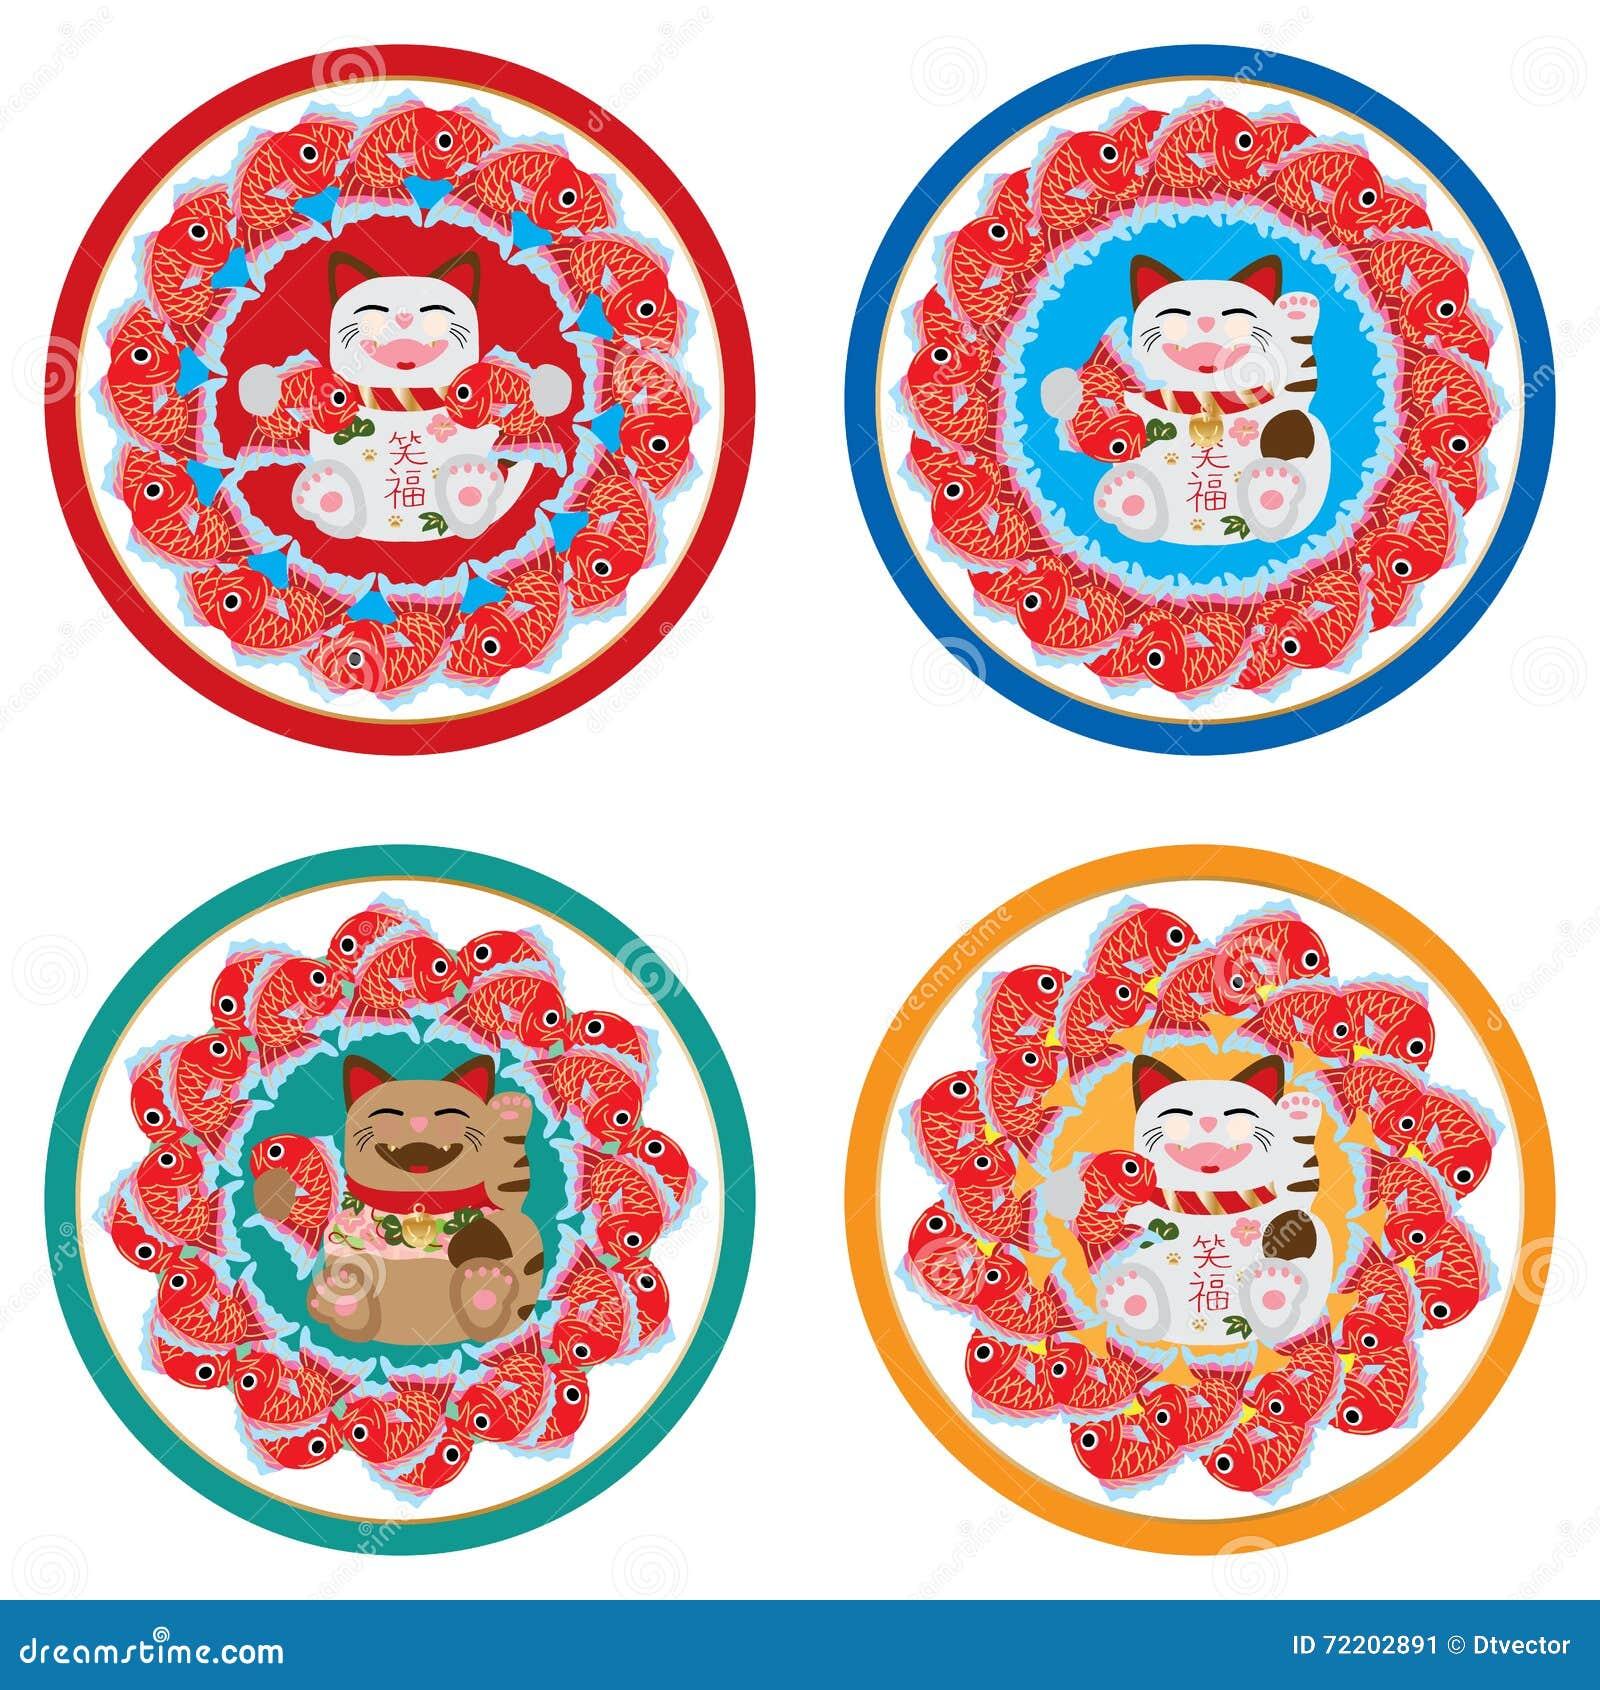 Maneki koi circle set stock image. Image of culture, food - 72202891